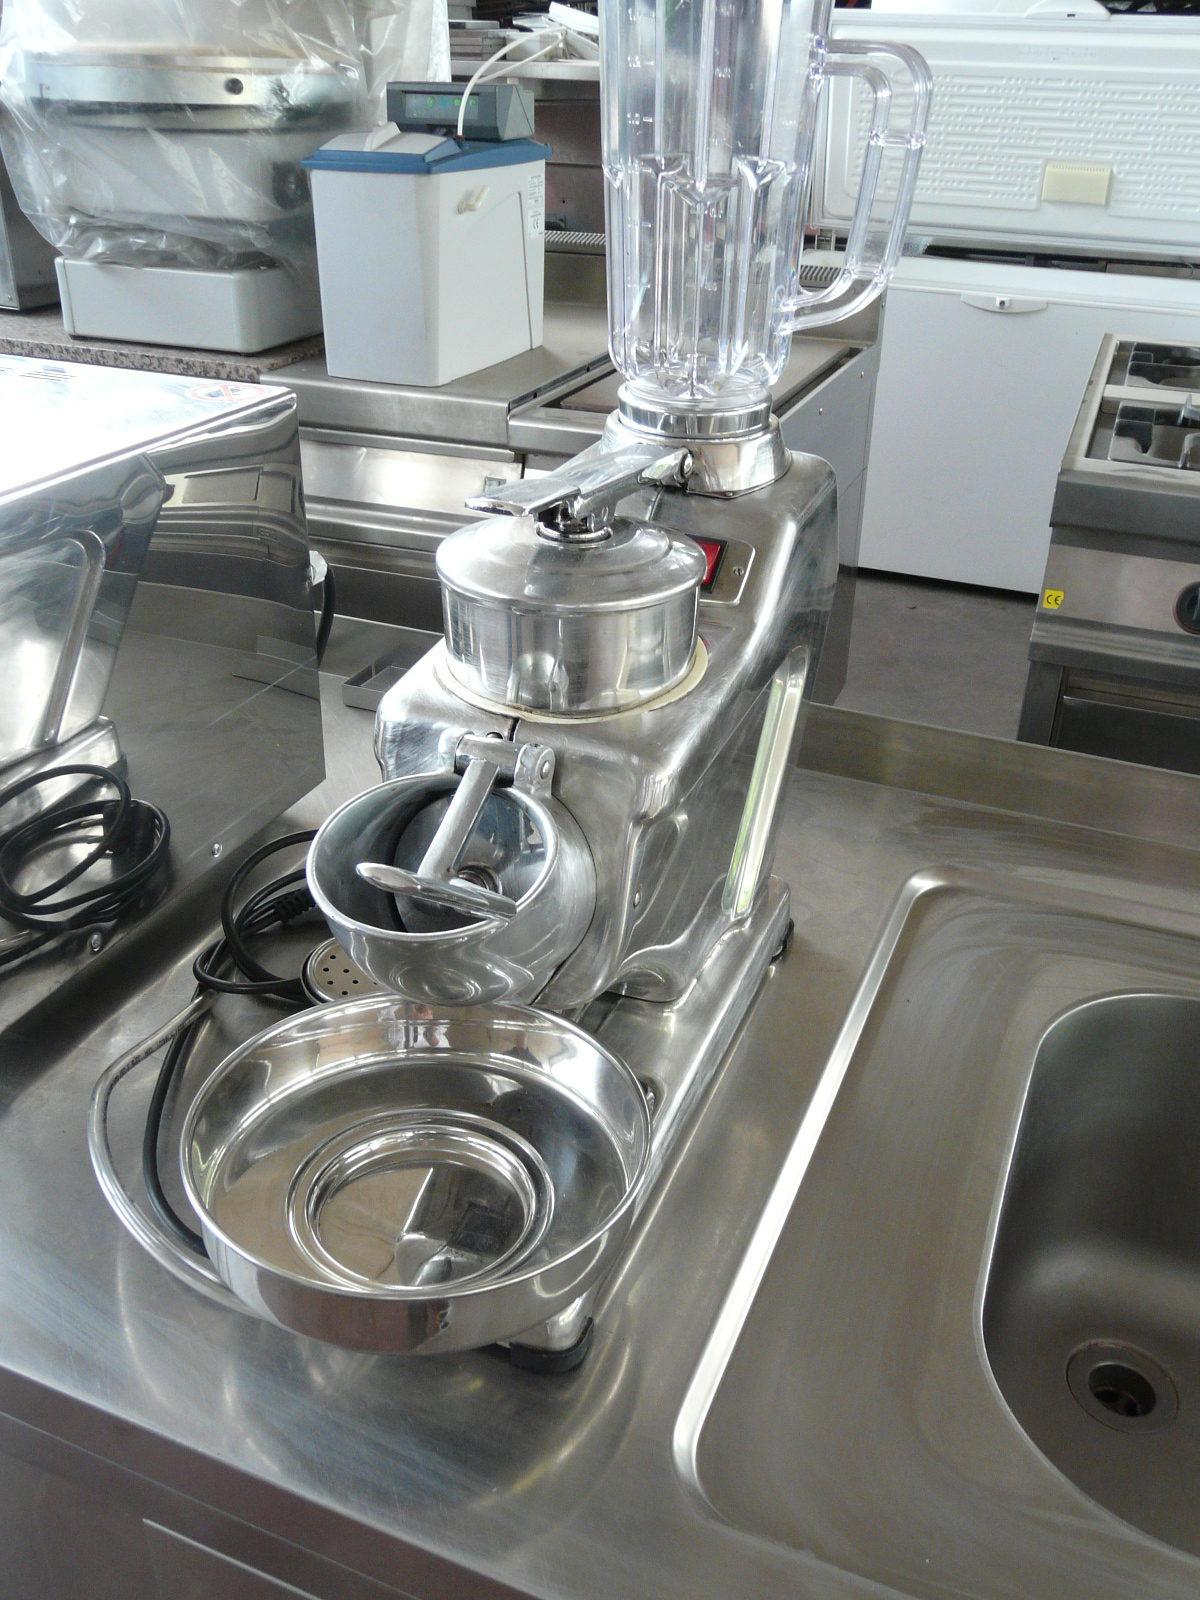 Cucine Industriali Usate Milano.Piro Gas Cucine Industriali Usate Lodi Brescia Milano